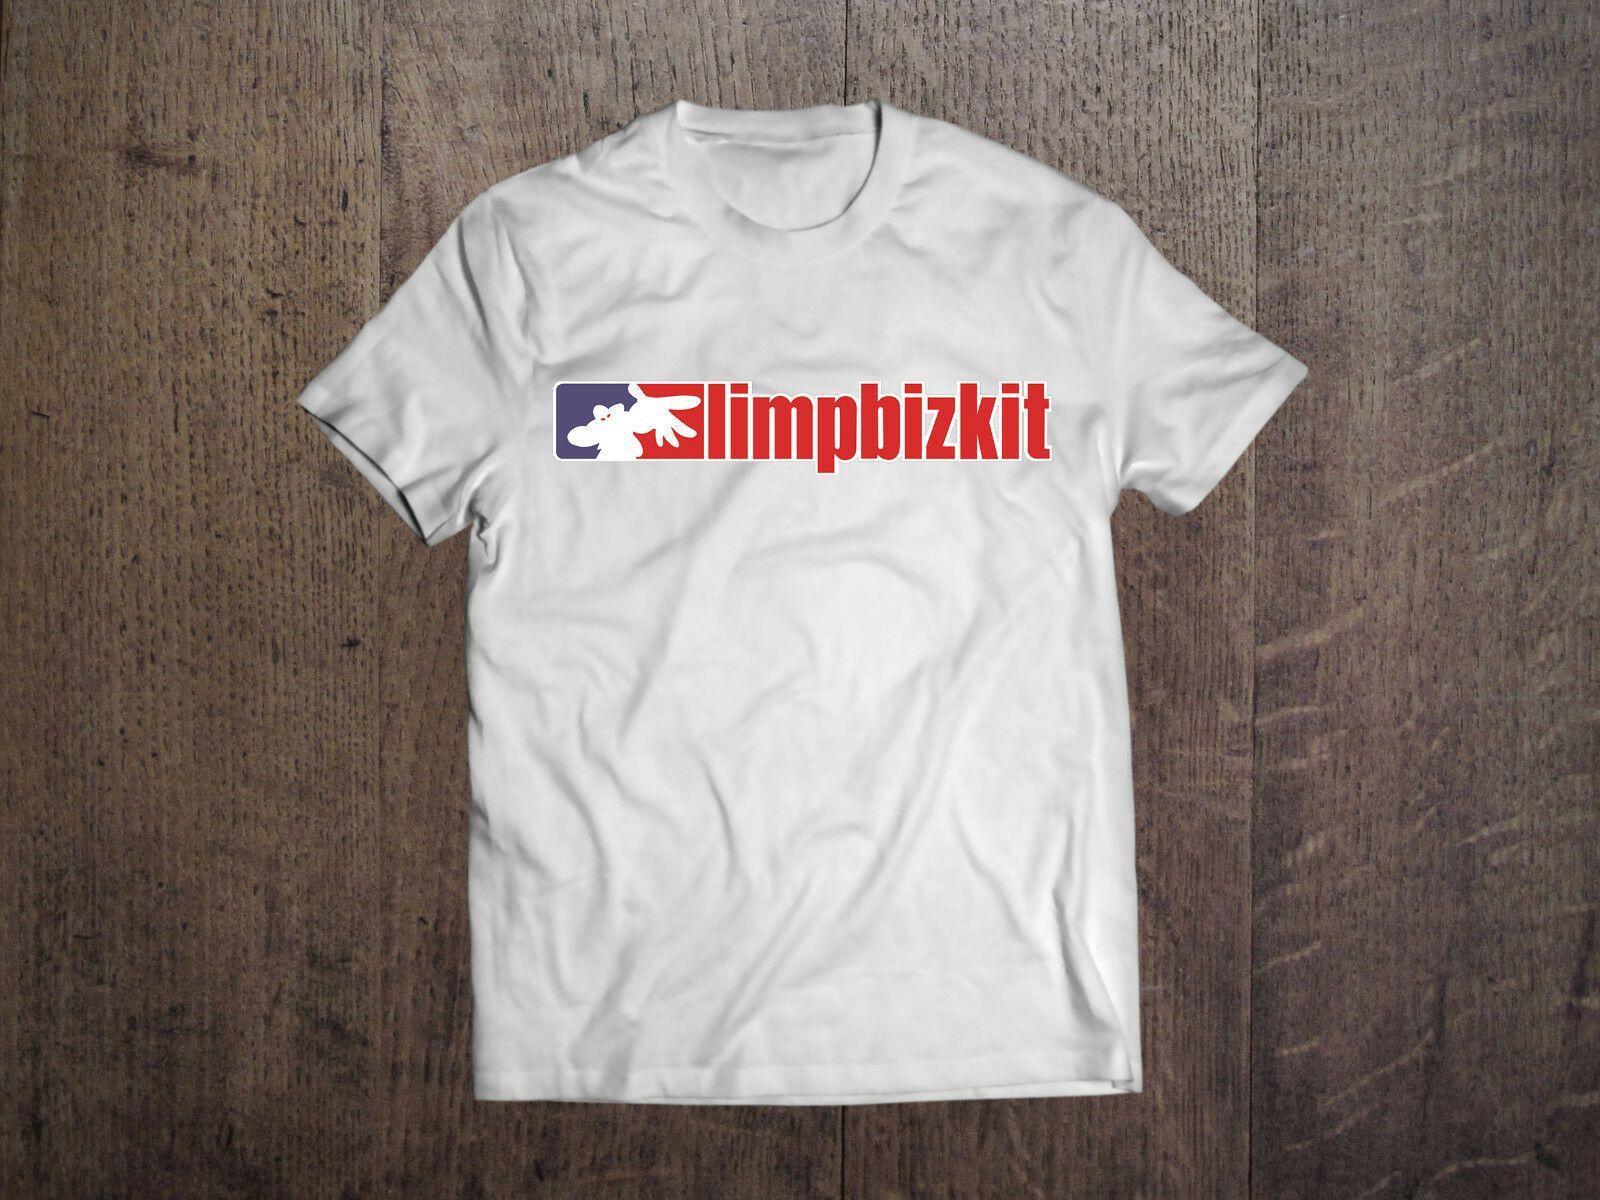 5159168e9 Limp Bizkit Men White T Shirt Rock Band Fan Tee Metal Shirt Funny Unisex  Tshirt Top T Shirts Sale Novelty Shirts From Colourfashion, $10.28|  DHgate.Com